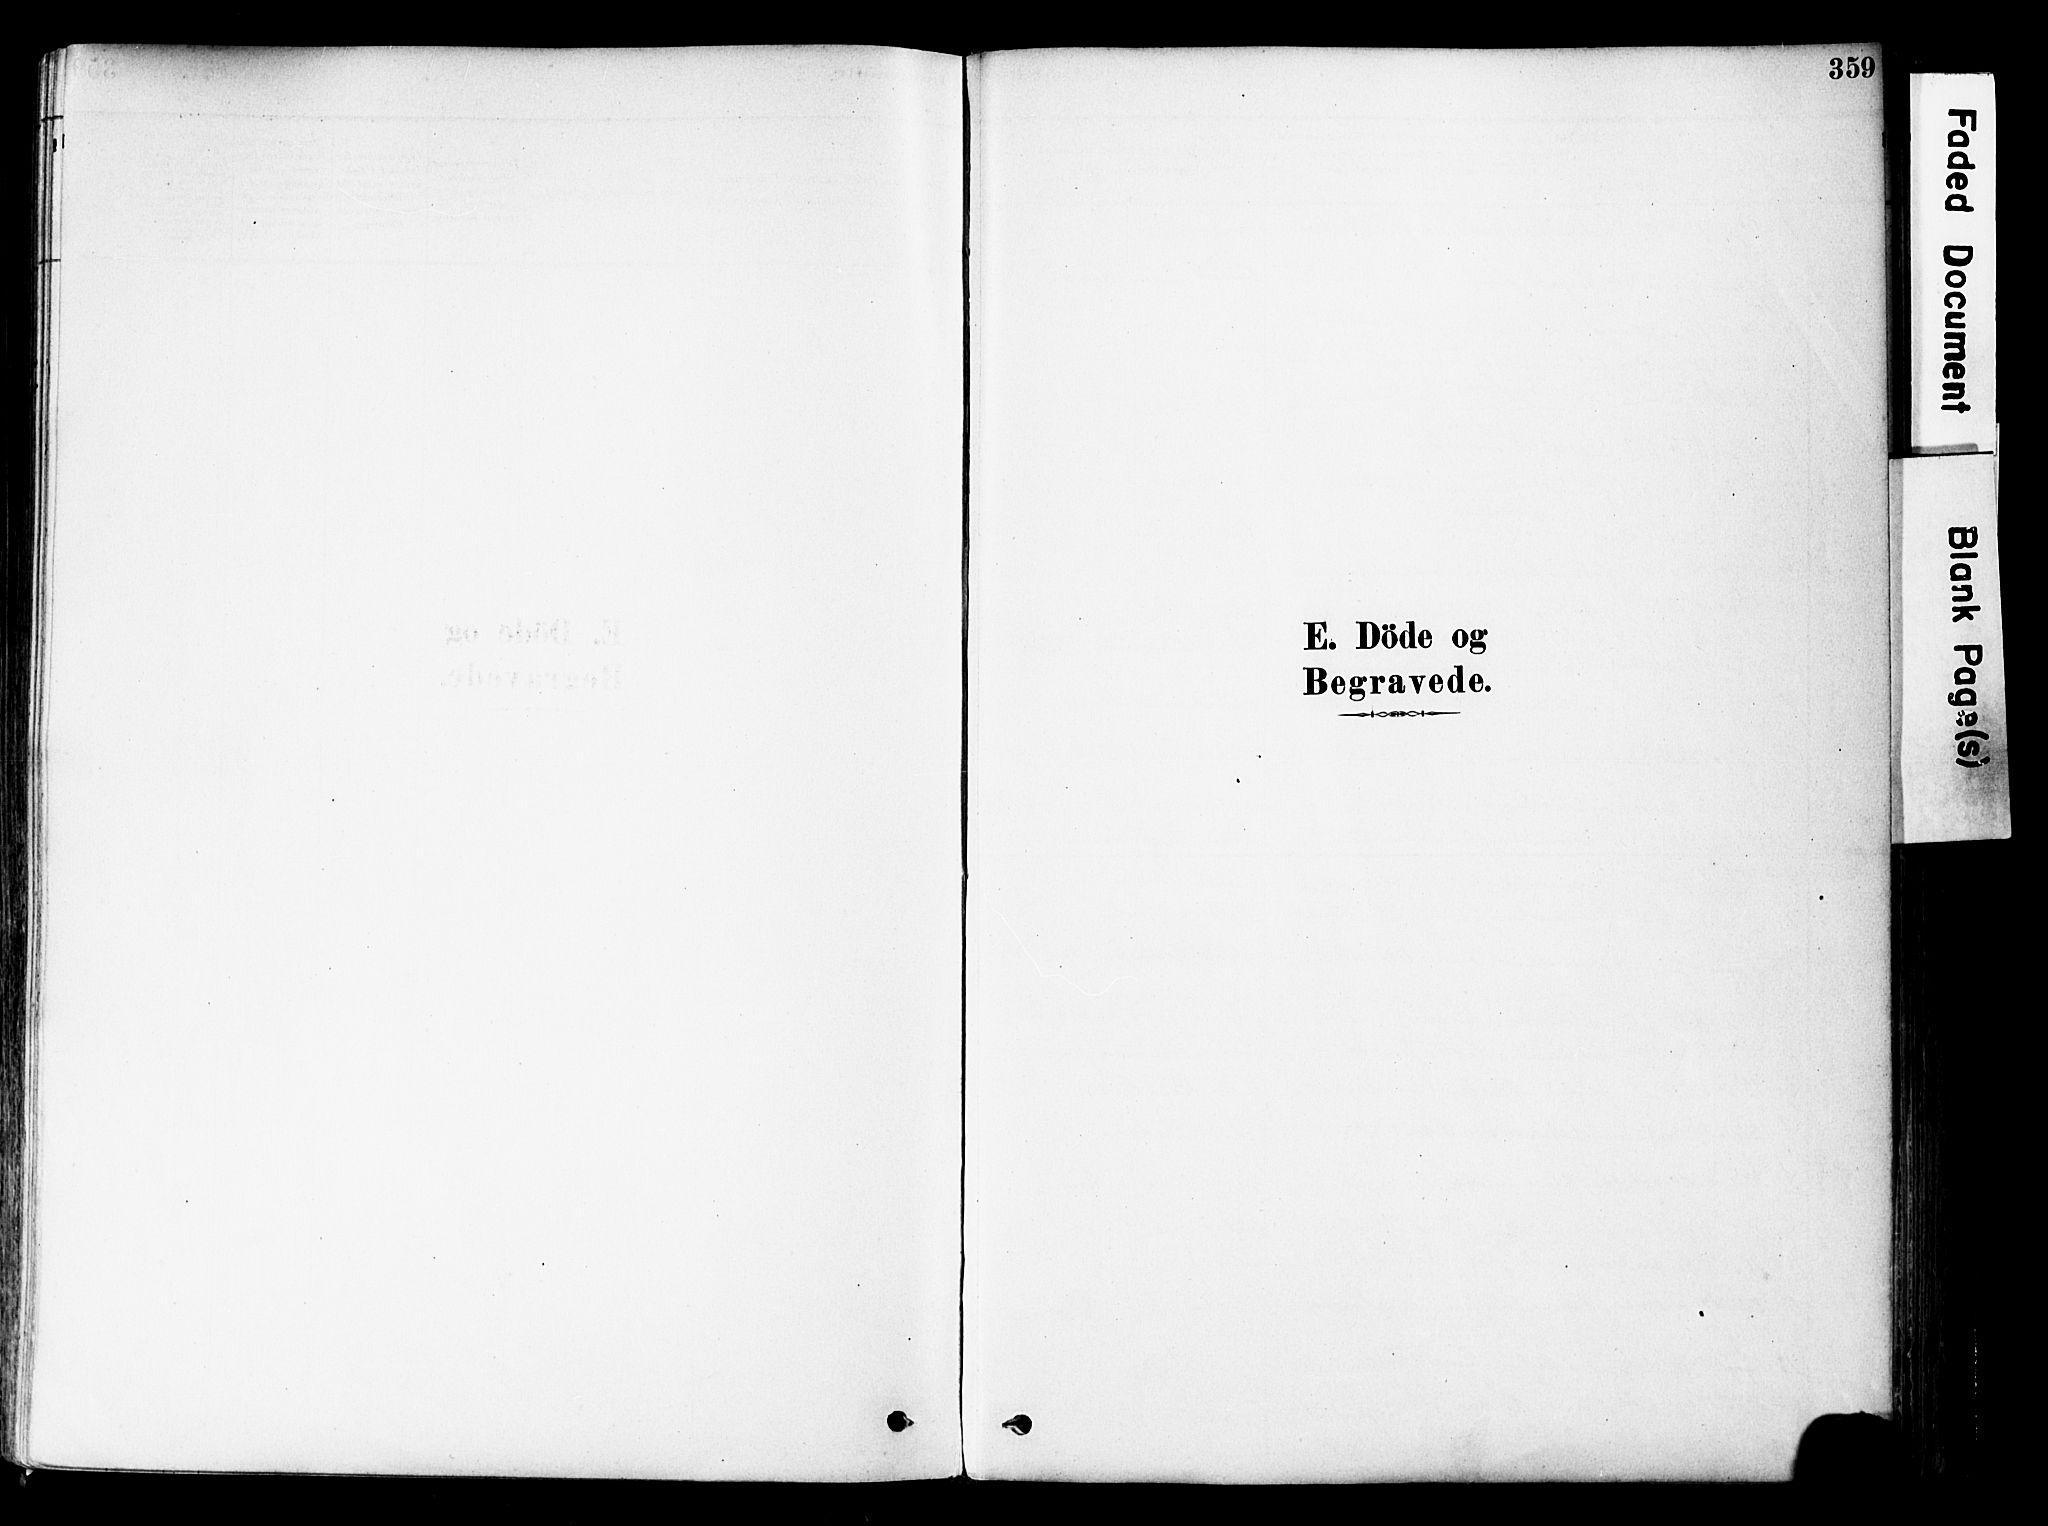 SAH, Østre Toten prestekontor, Ministerialbok nr. 6 /1, 1878-1896, s. 359